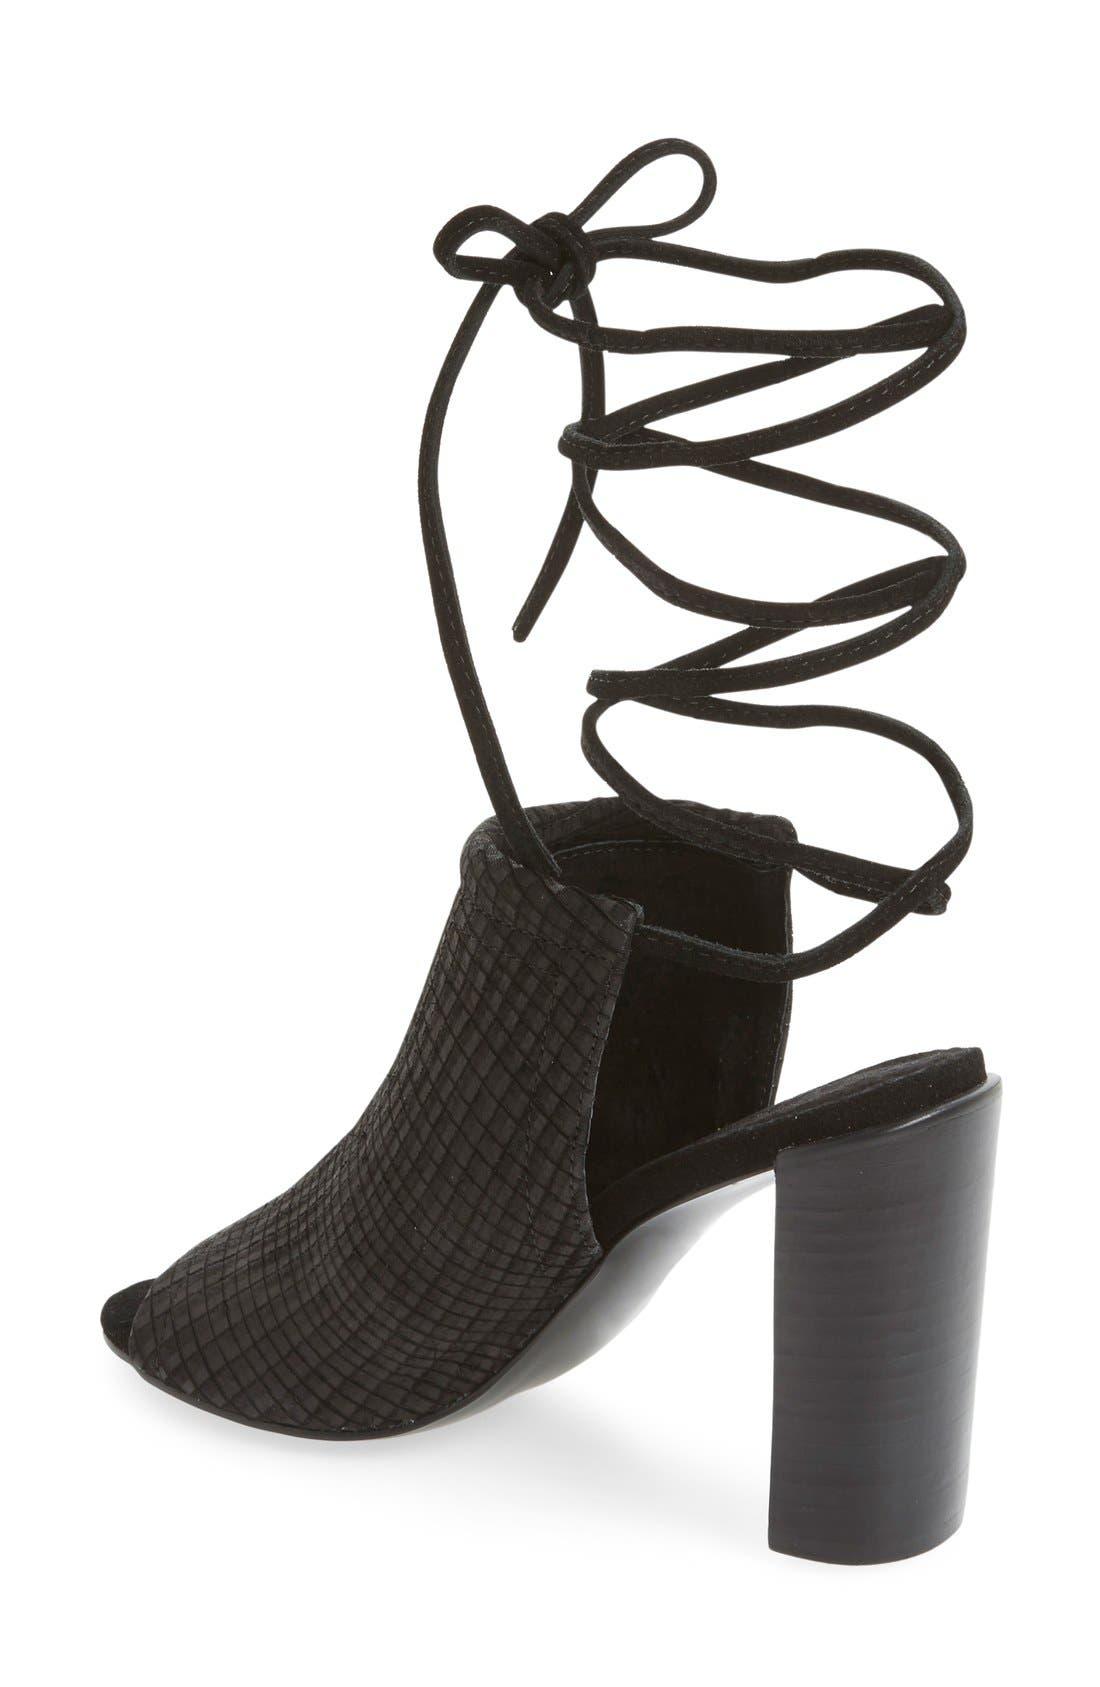 Alternate Image 2  - Urge Footwear 'Eve' Lace-Up Mule Sandal (Women)